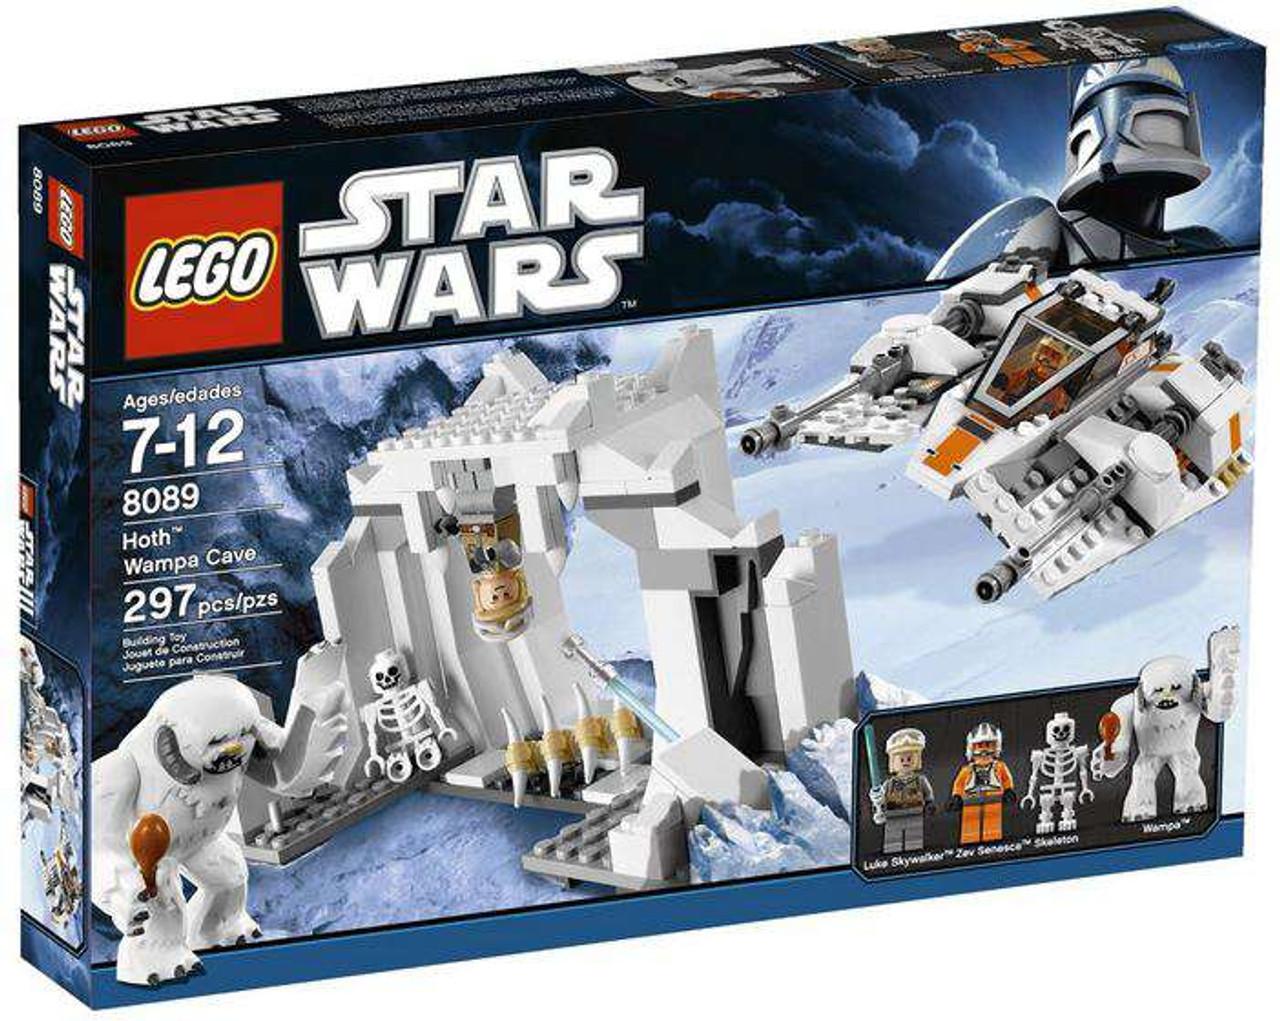 LEGO Star Wars Empire Strikes Back Hoth Wampa Cave Set #8089